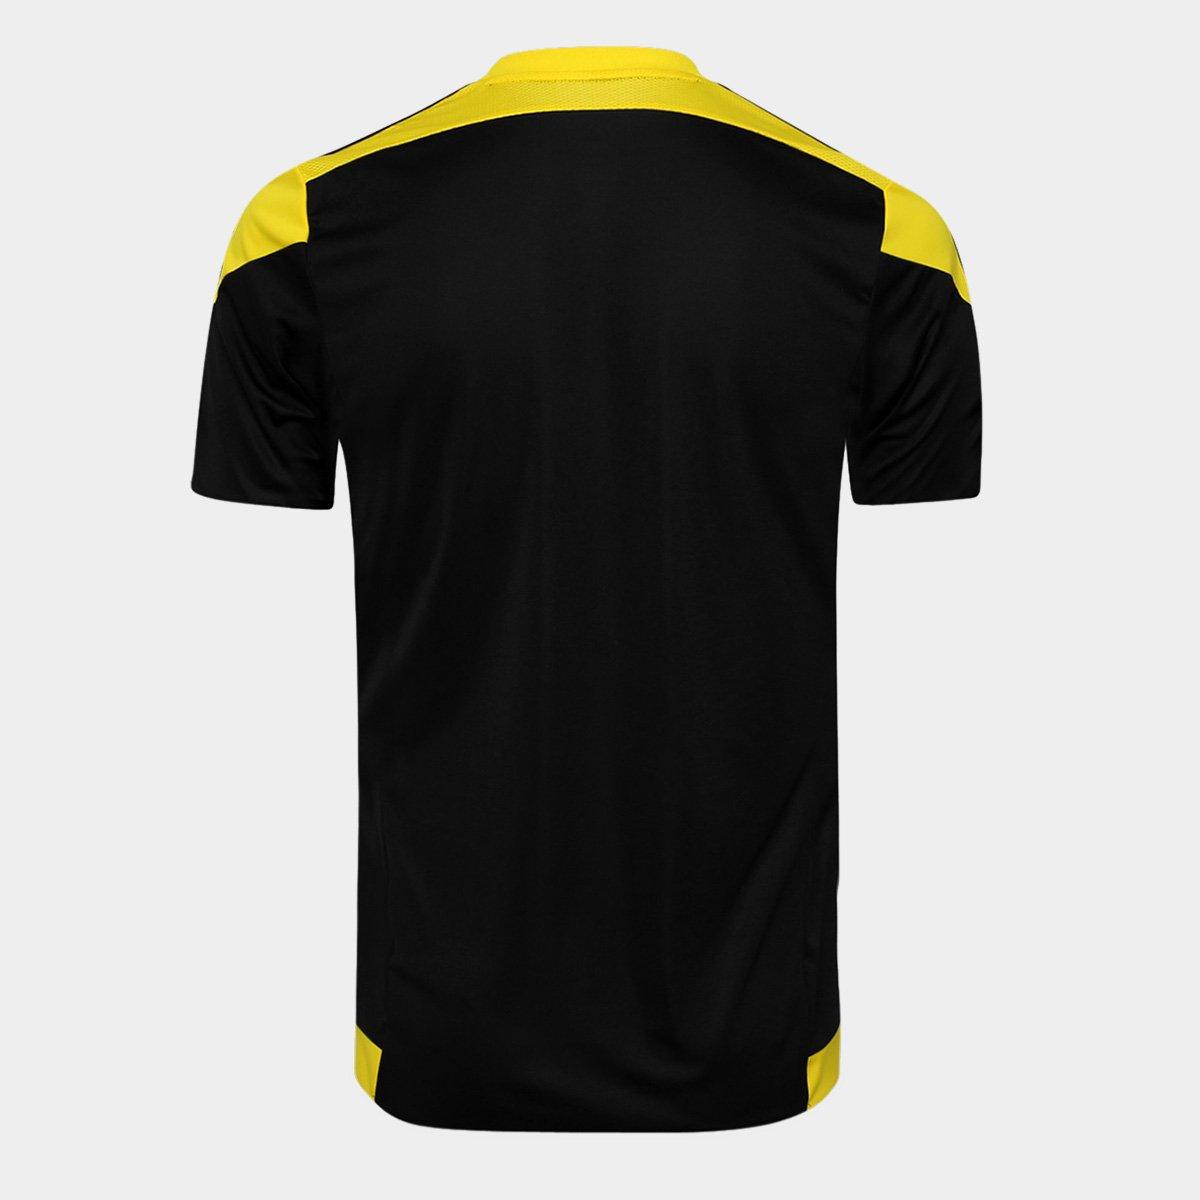 Camisa Adidas Striped 15 Masculina Amarelo e Preto